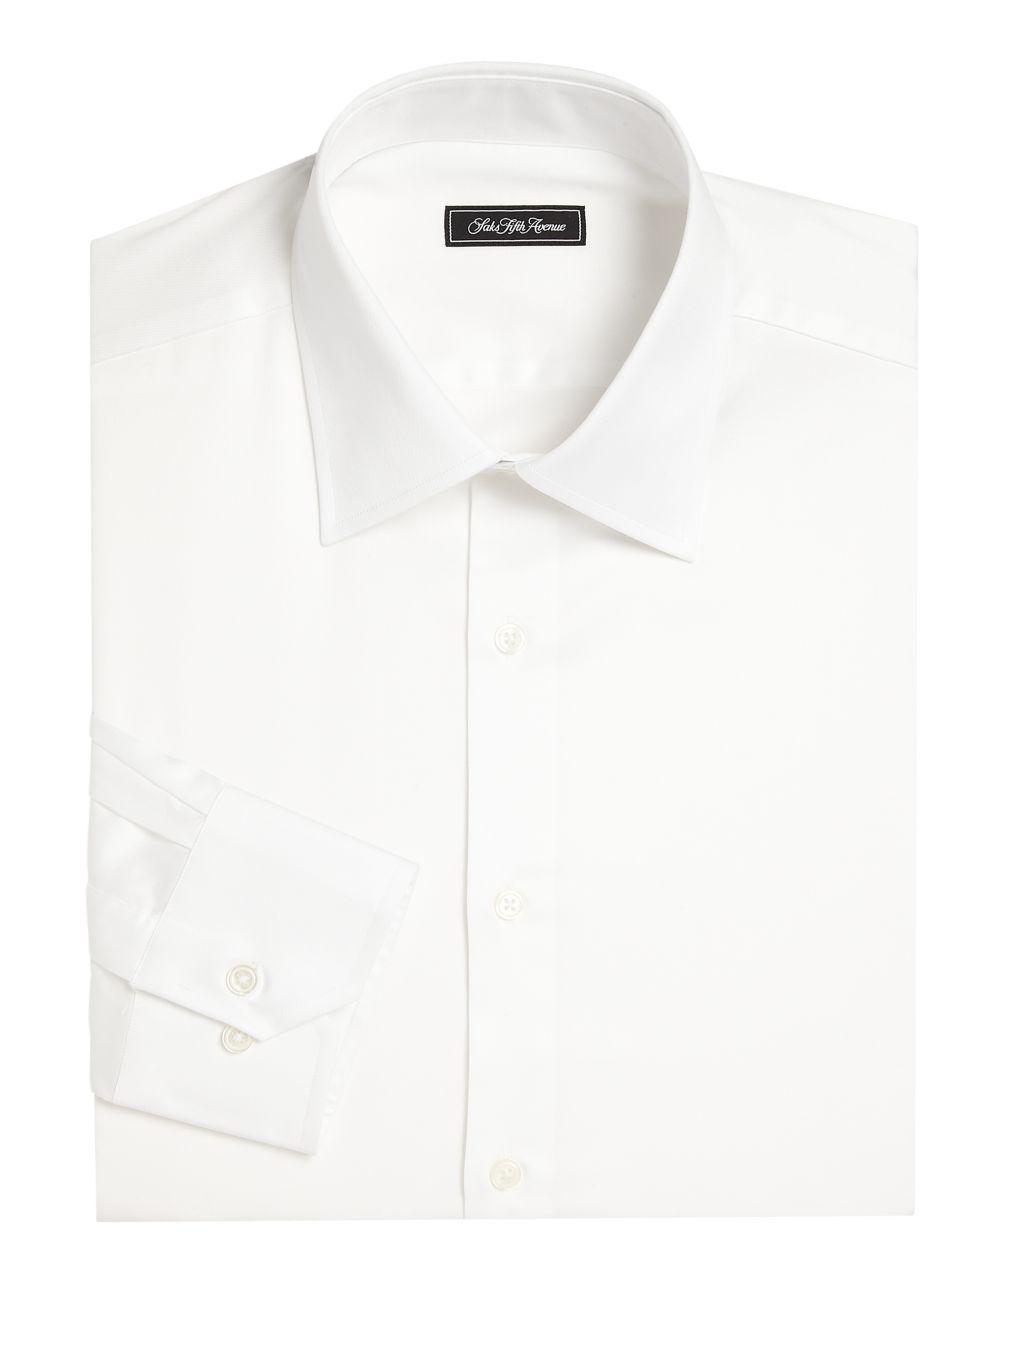 Saks Fifth Avenue COLLECTION Regular-Fit Cotton Dress Shirt